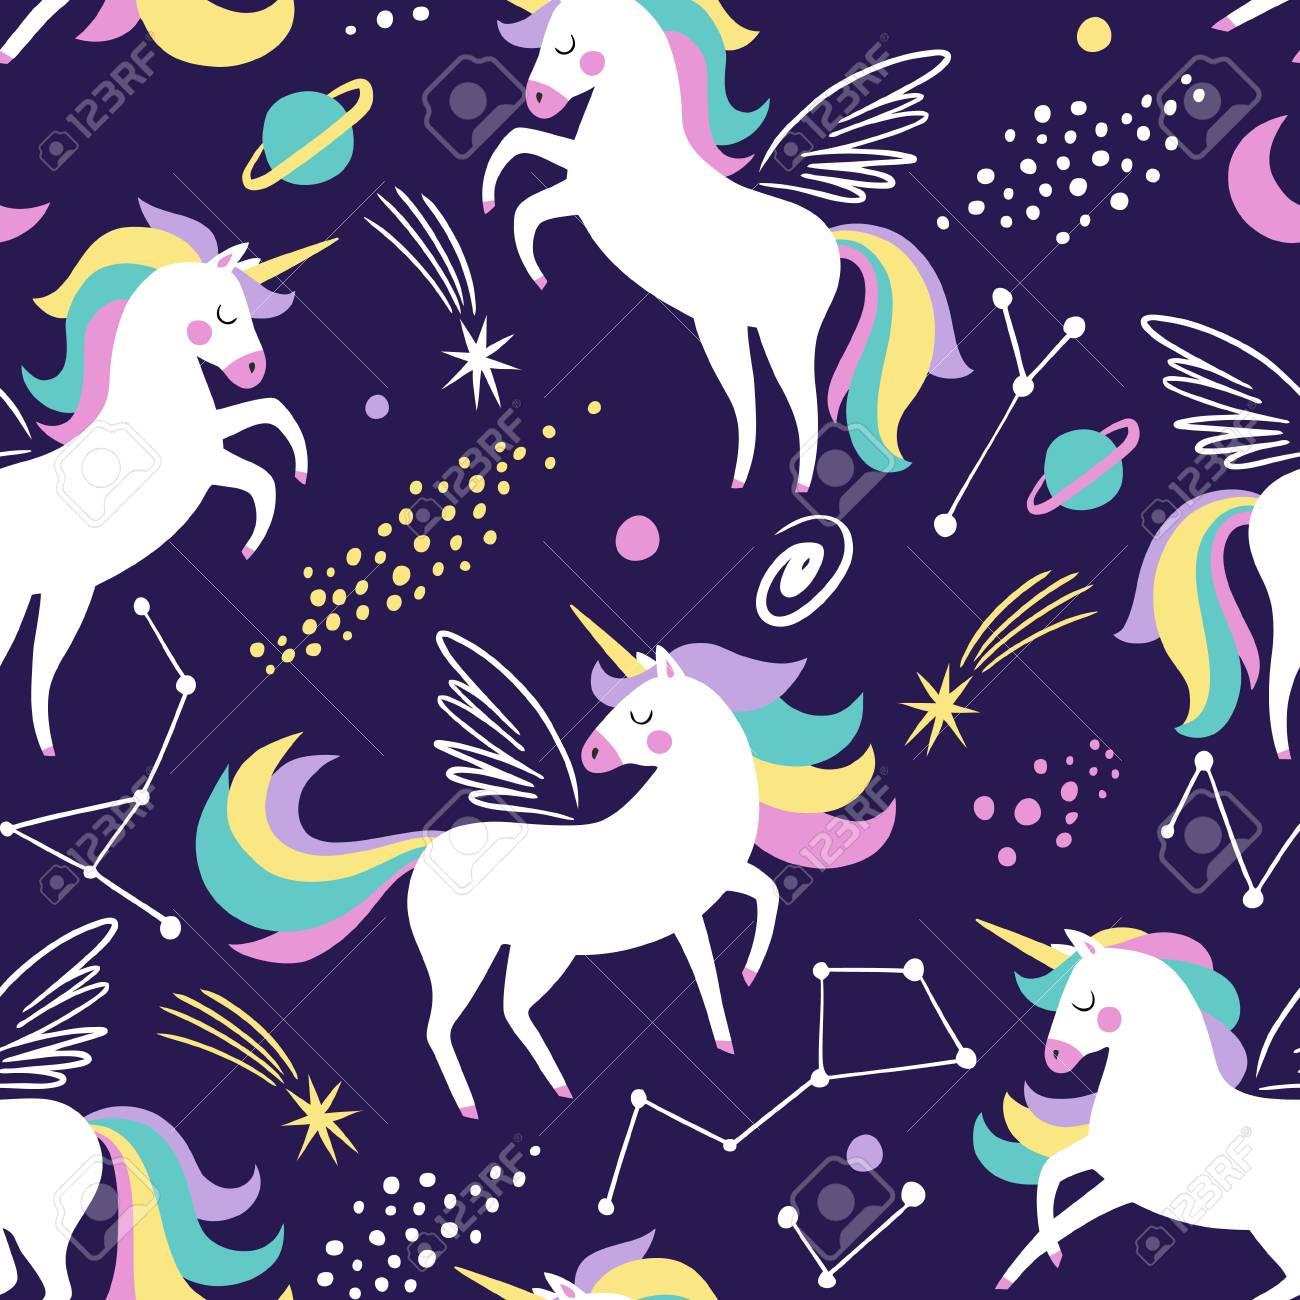 Hand Drawn Seamless Vector Pattern With Cute Unicorns Stars